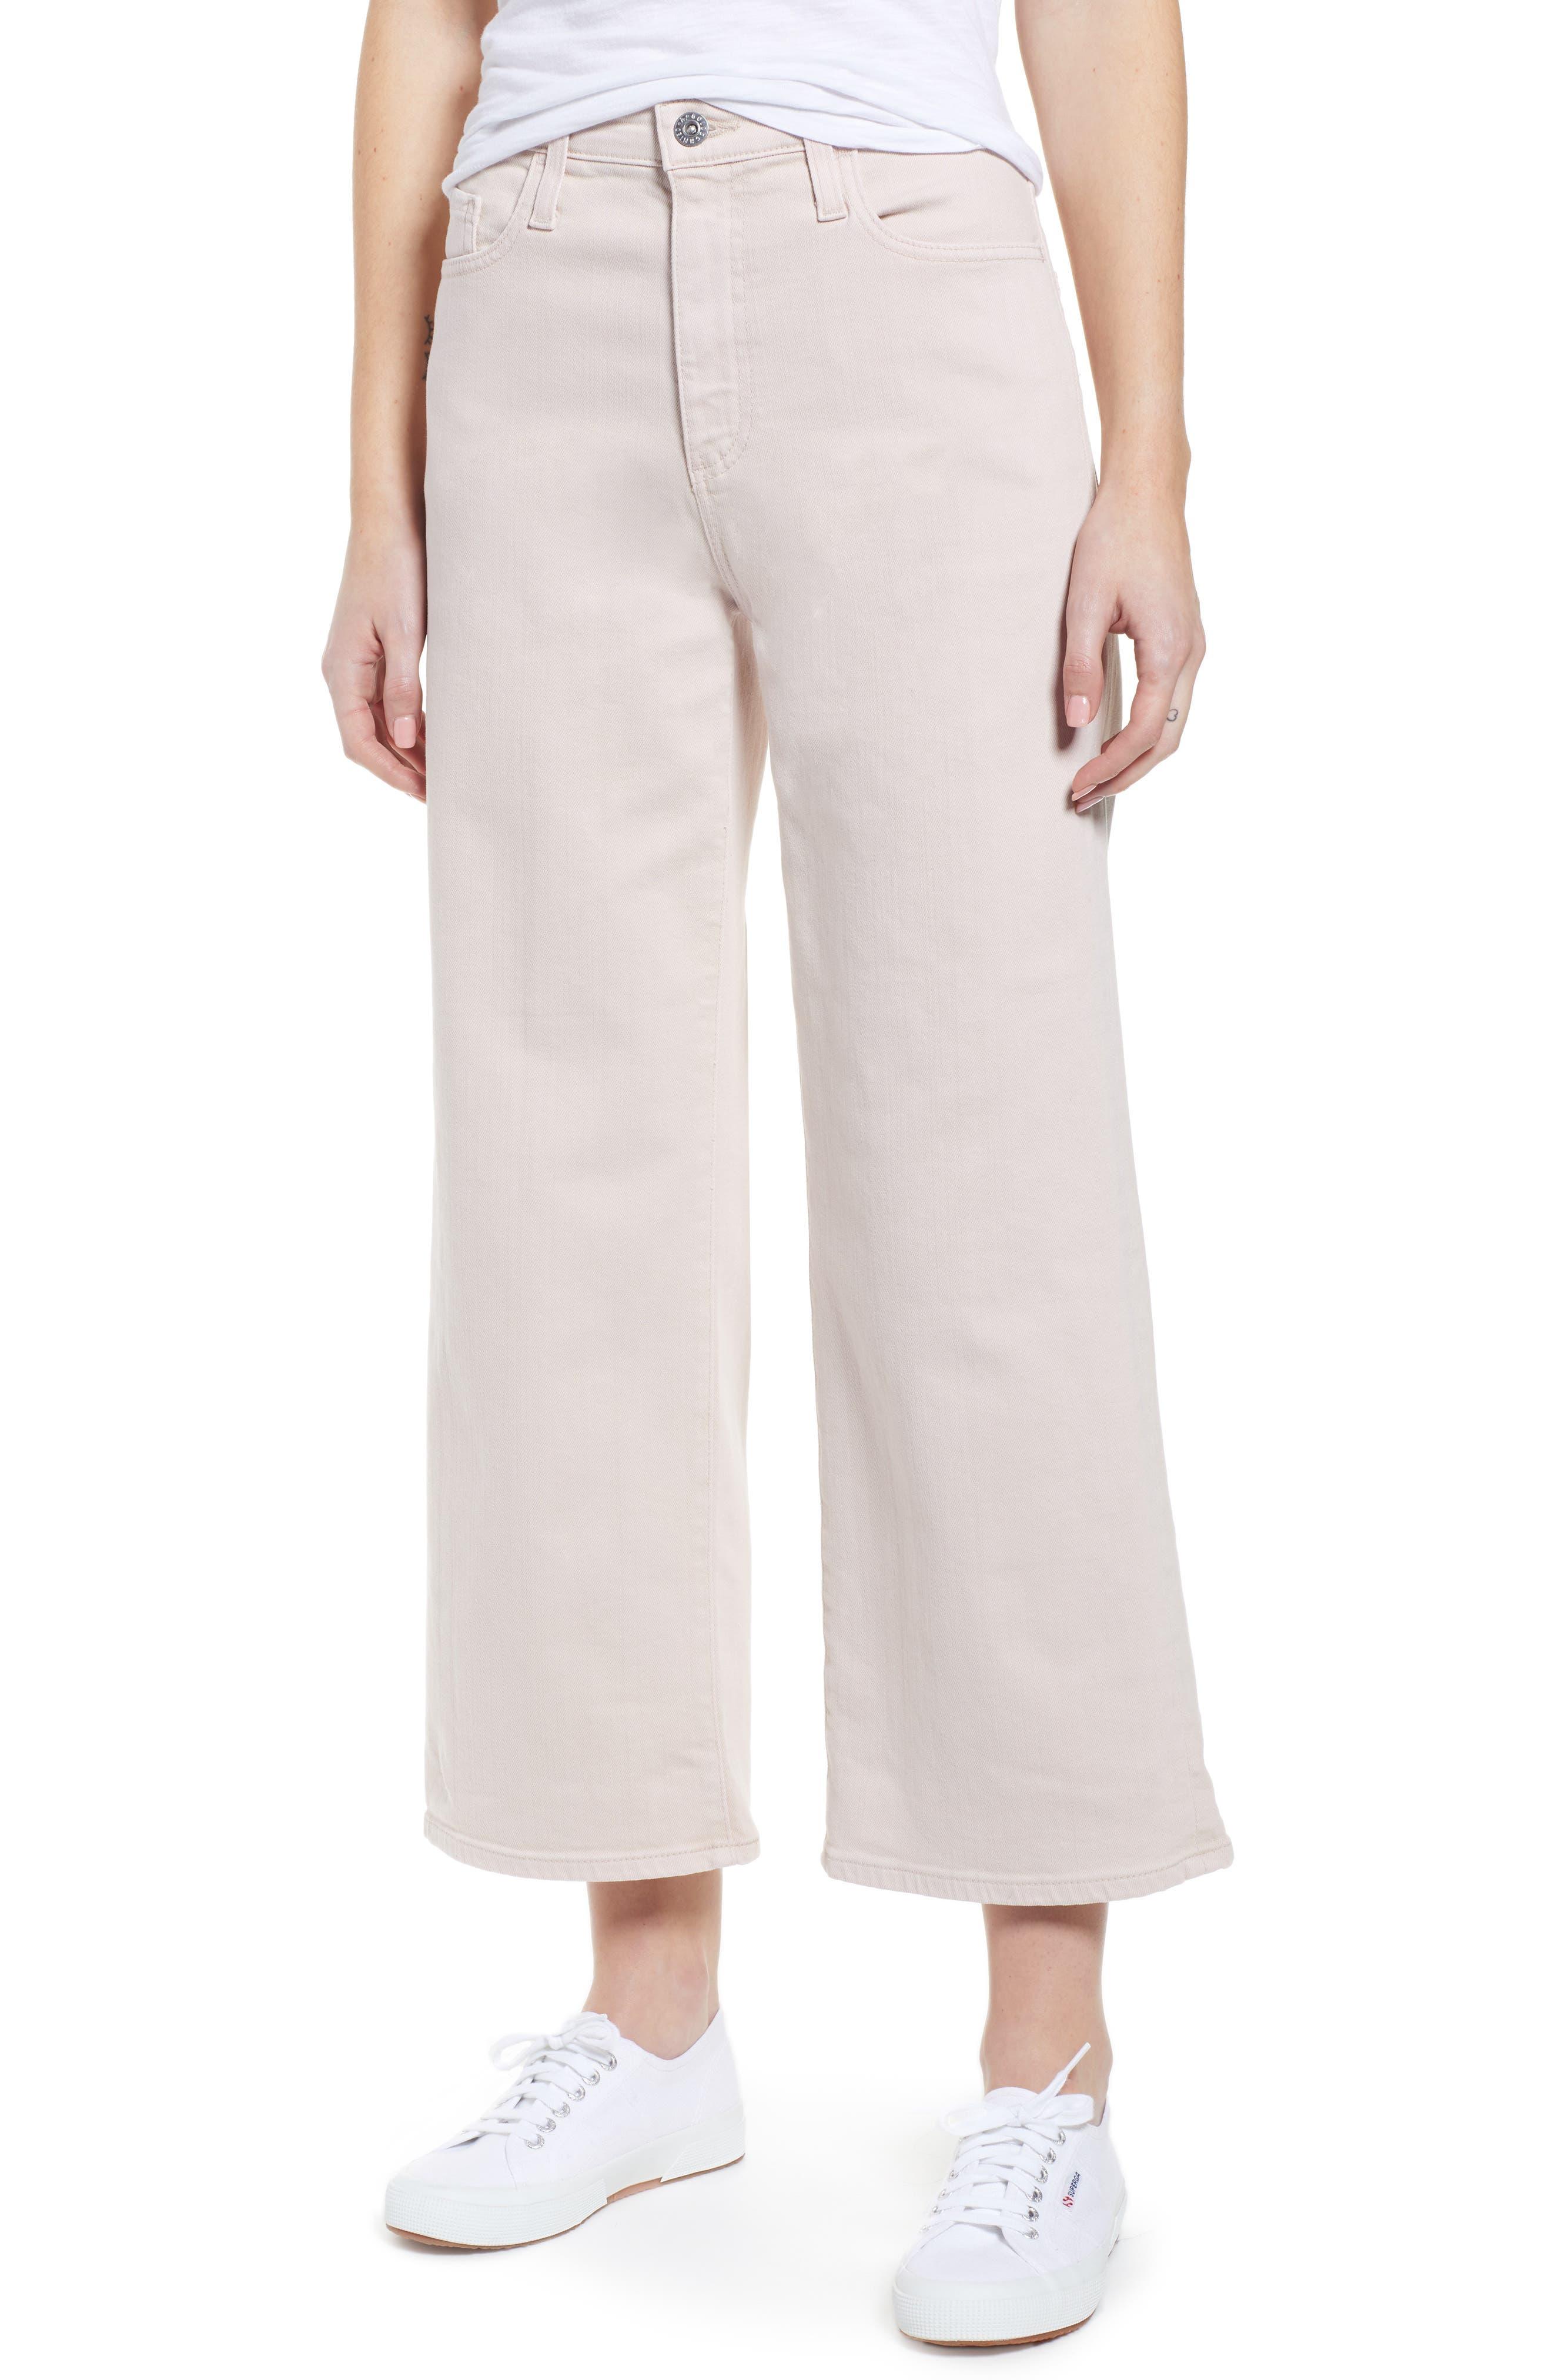 AG, Etta High Waist Crop Wide Leg Jeans, Main thumbnail 1, color, SULFUR PEAKED PINK